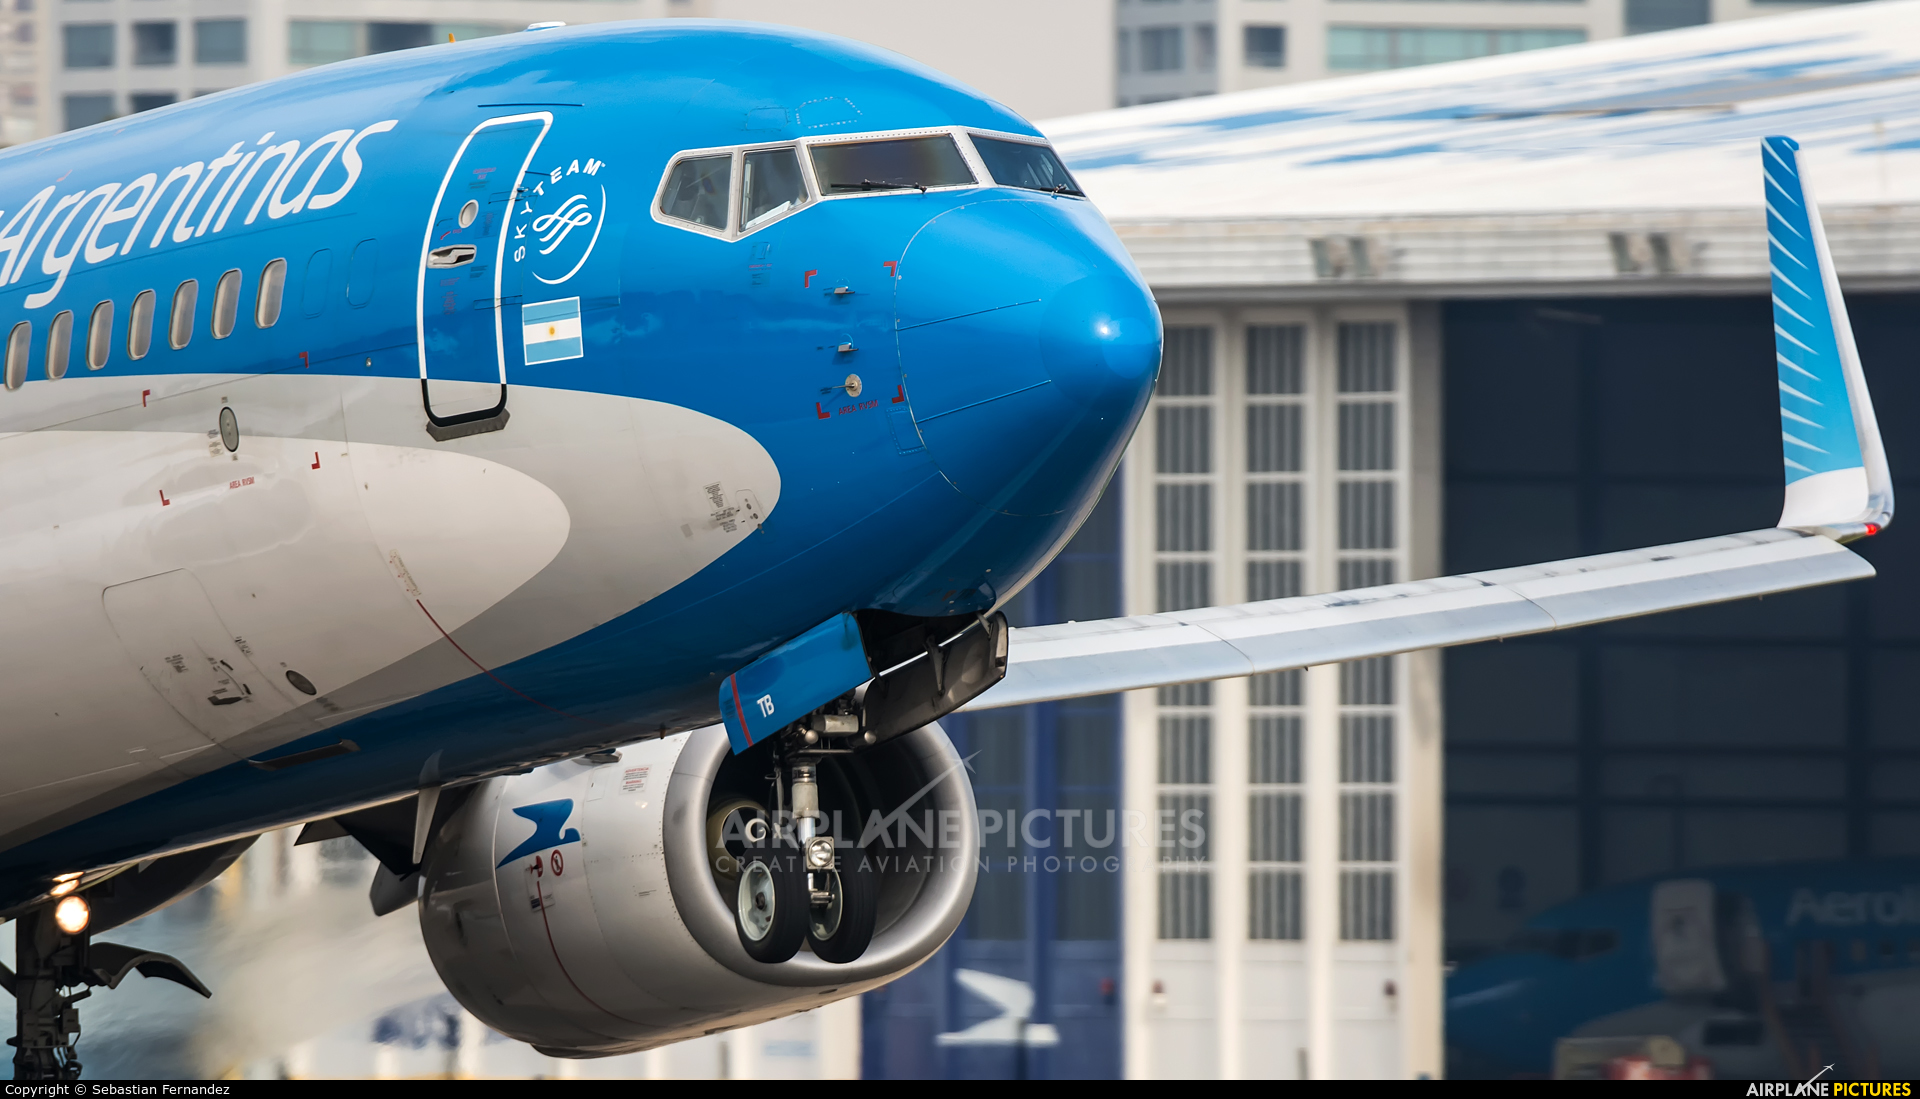 Aerolineas Argentinas LV-CTB aircraft at Buenos Aires - Jorge Newbery